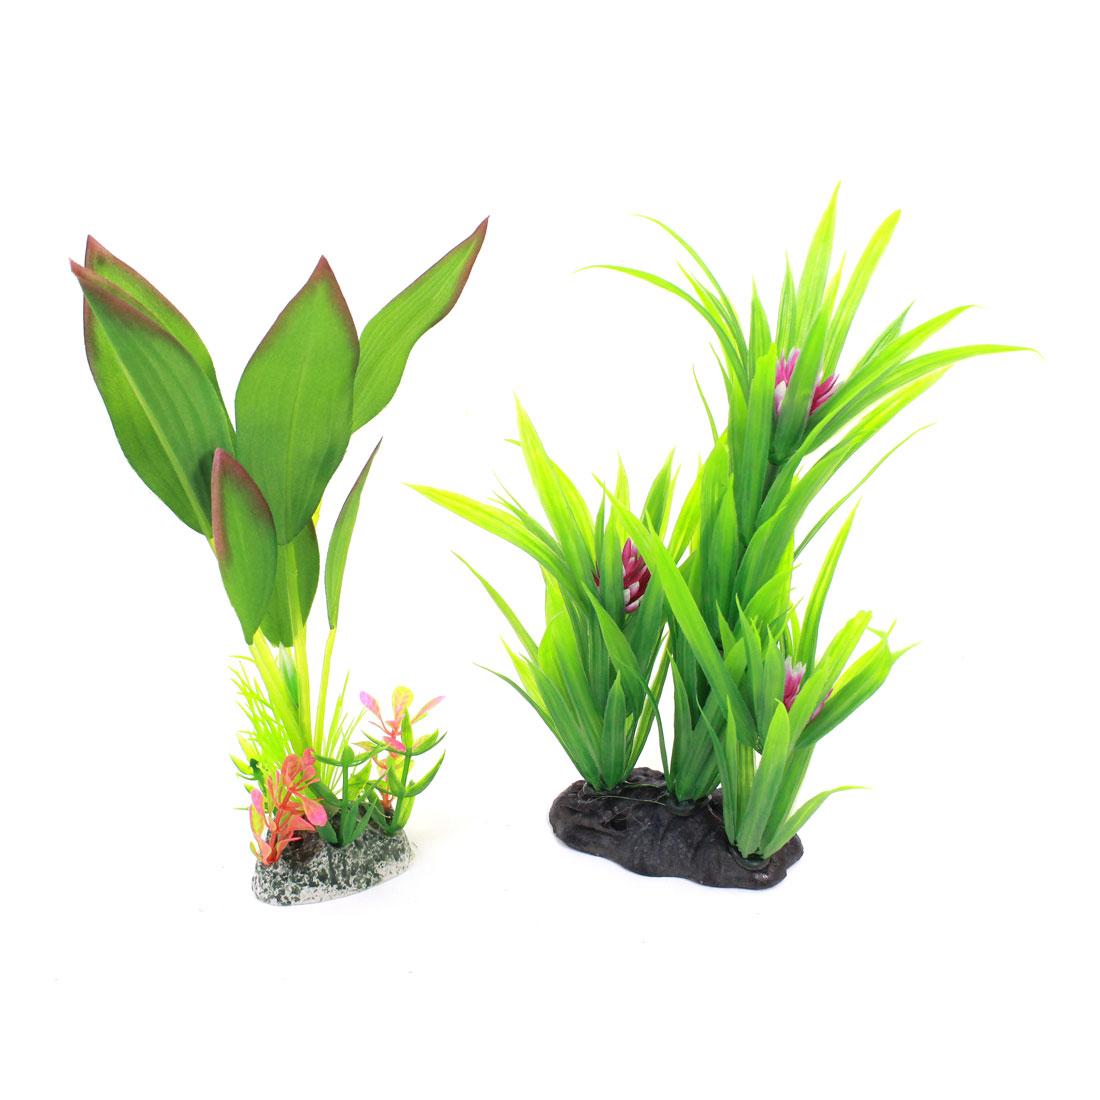 Fish Tank Simulation Purple Flower Detail Aquatic Grass Green 23cm High 2 Pcs